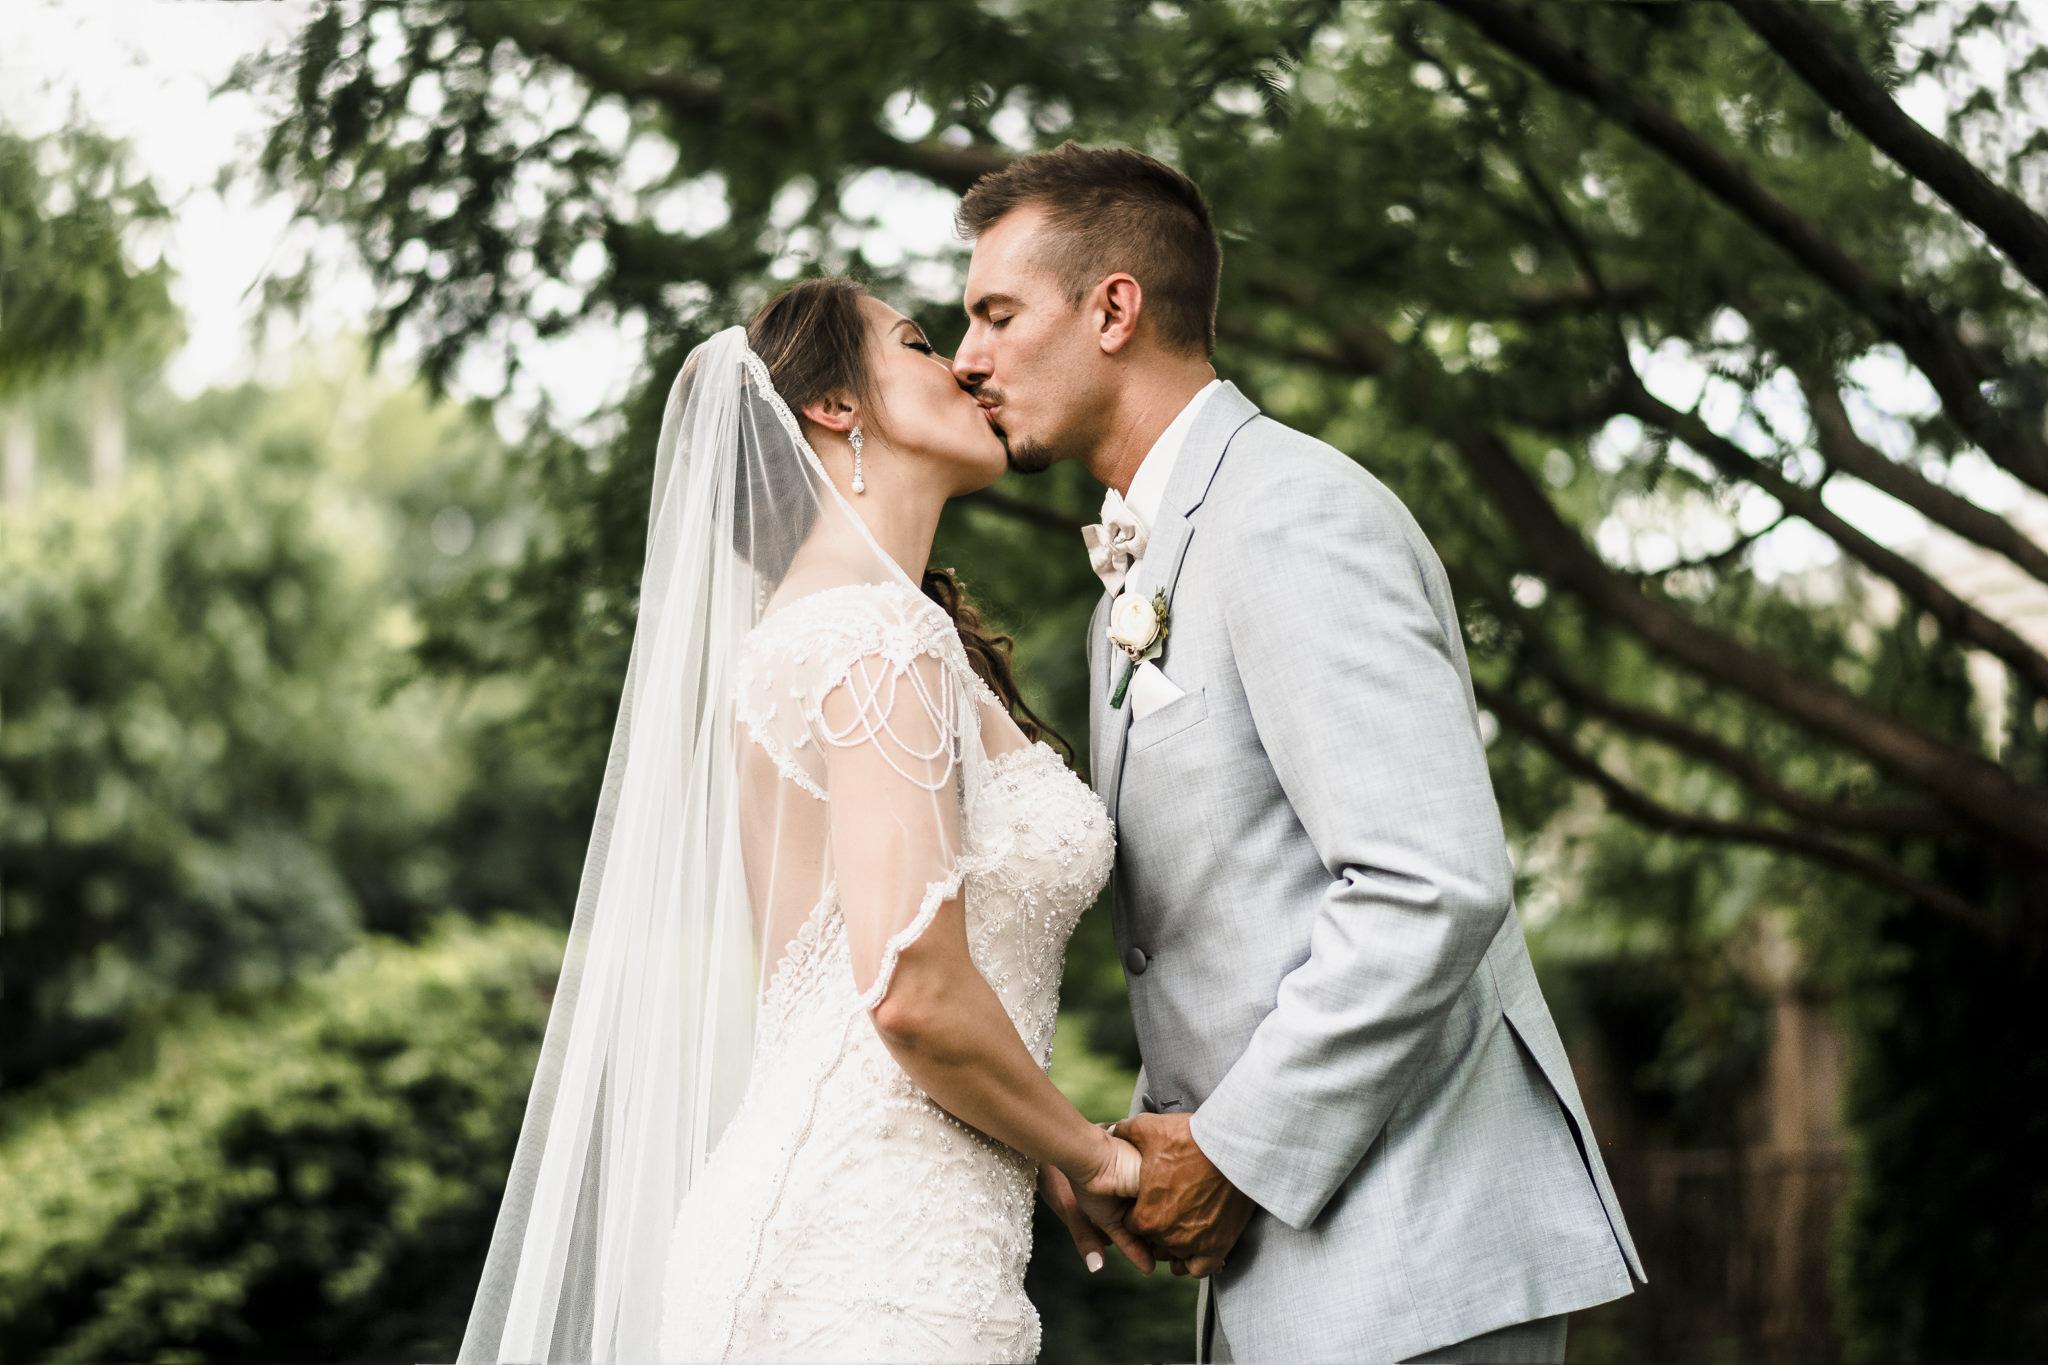 Barbato-Moorestown-Community-House-Wedding-New-Jersey-Photographer-18.JPG